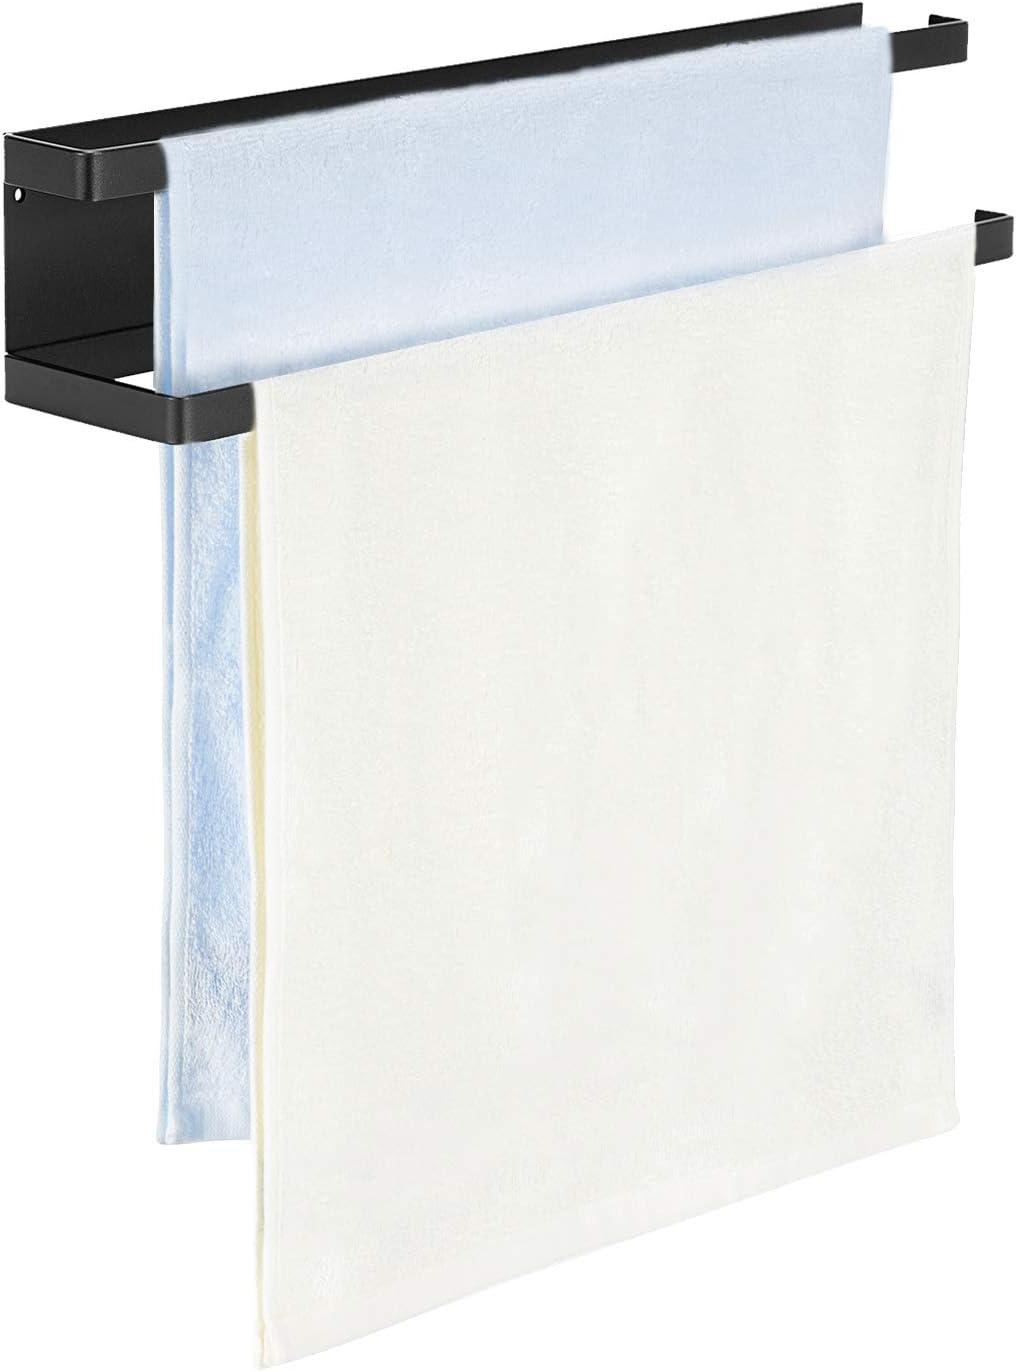 Pittaigo Magnetic Towel Bar for Refrigerator, Kitchen Towel Holder Dish Towel Hanger 15.7'' for Hand Tea Towels, for Kitchen Stove, Oven, Dishwasher, Sink, Laundry Washing Machine, No Drilling, Black